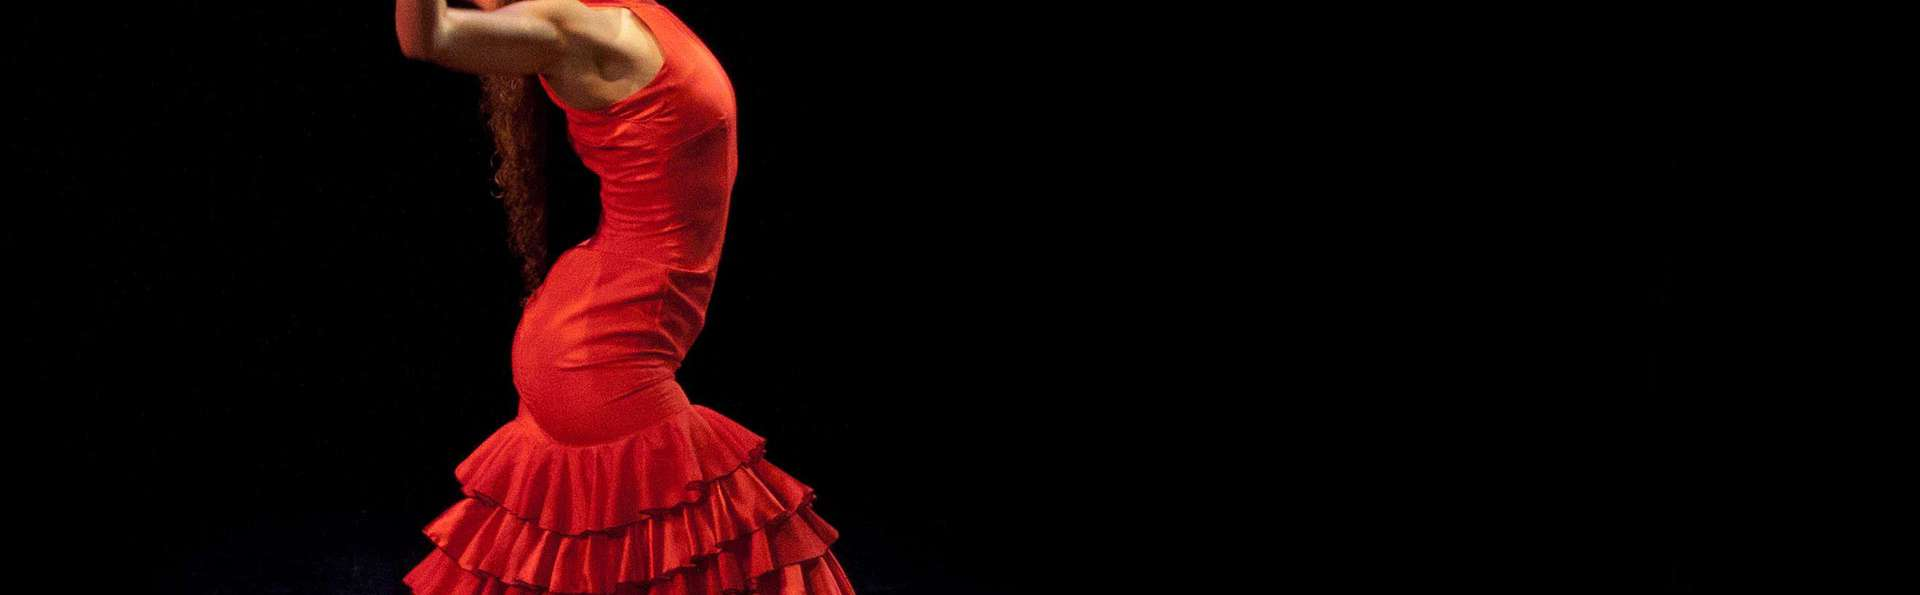 Séjour a Barcelone avec tickets au Palacio del Flamenco